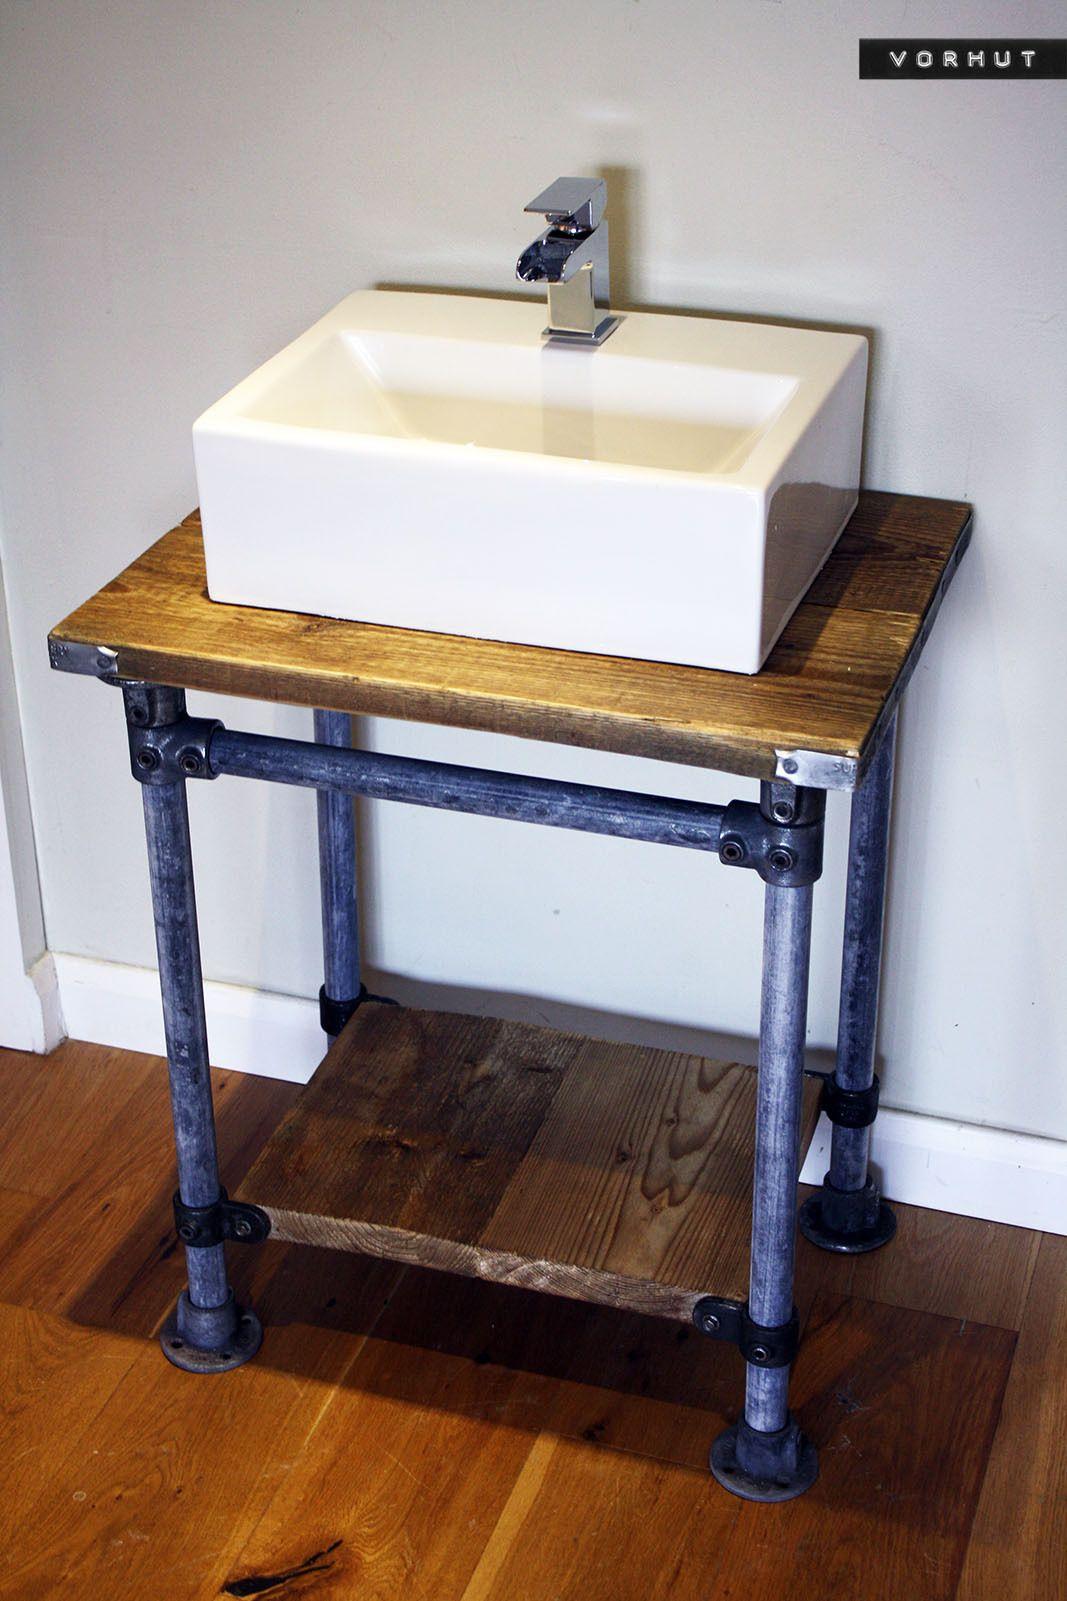 Vorhut Kraken Free Standing Industrial Counter Top Vanity Unit Free Standing Kitchen Sink Sink Vanity Unit Custom Bathroom Vanity